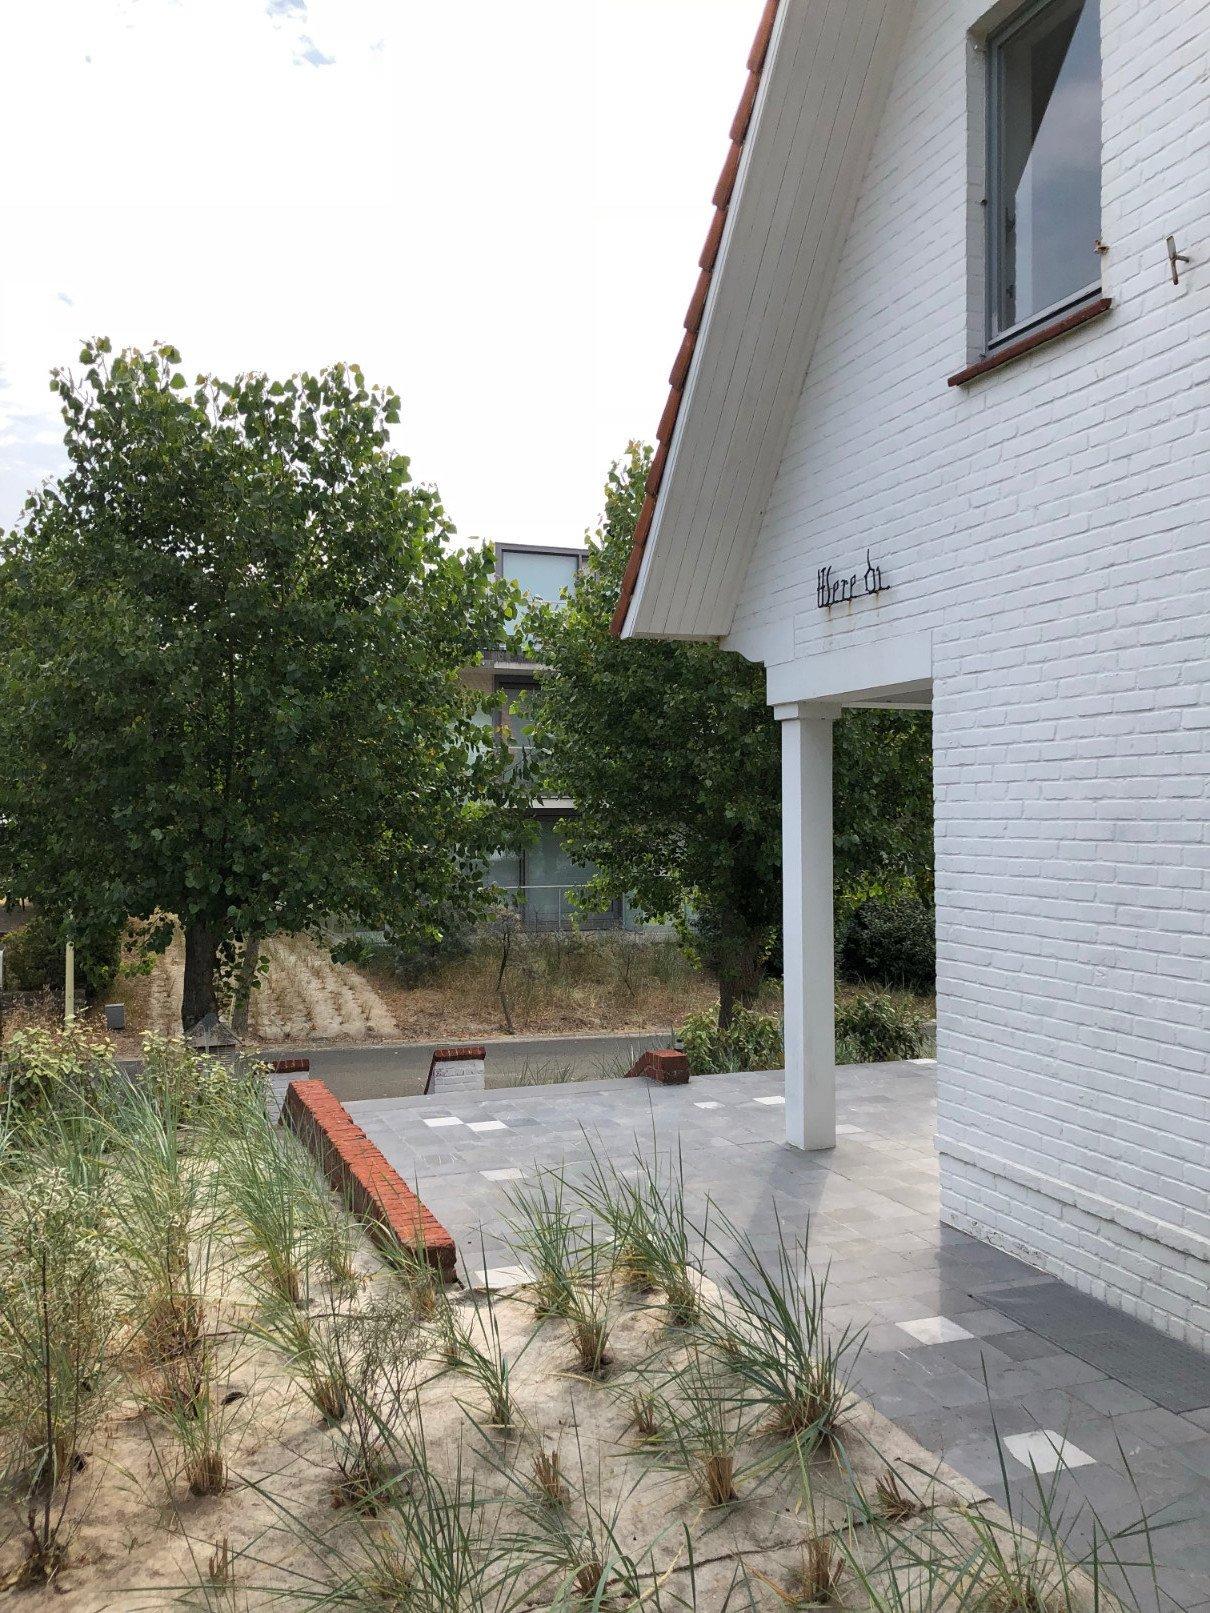 Rietveldprojects-Villa Were Di - Te Koop : Te Huur (per week)26.jpg